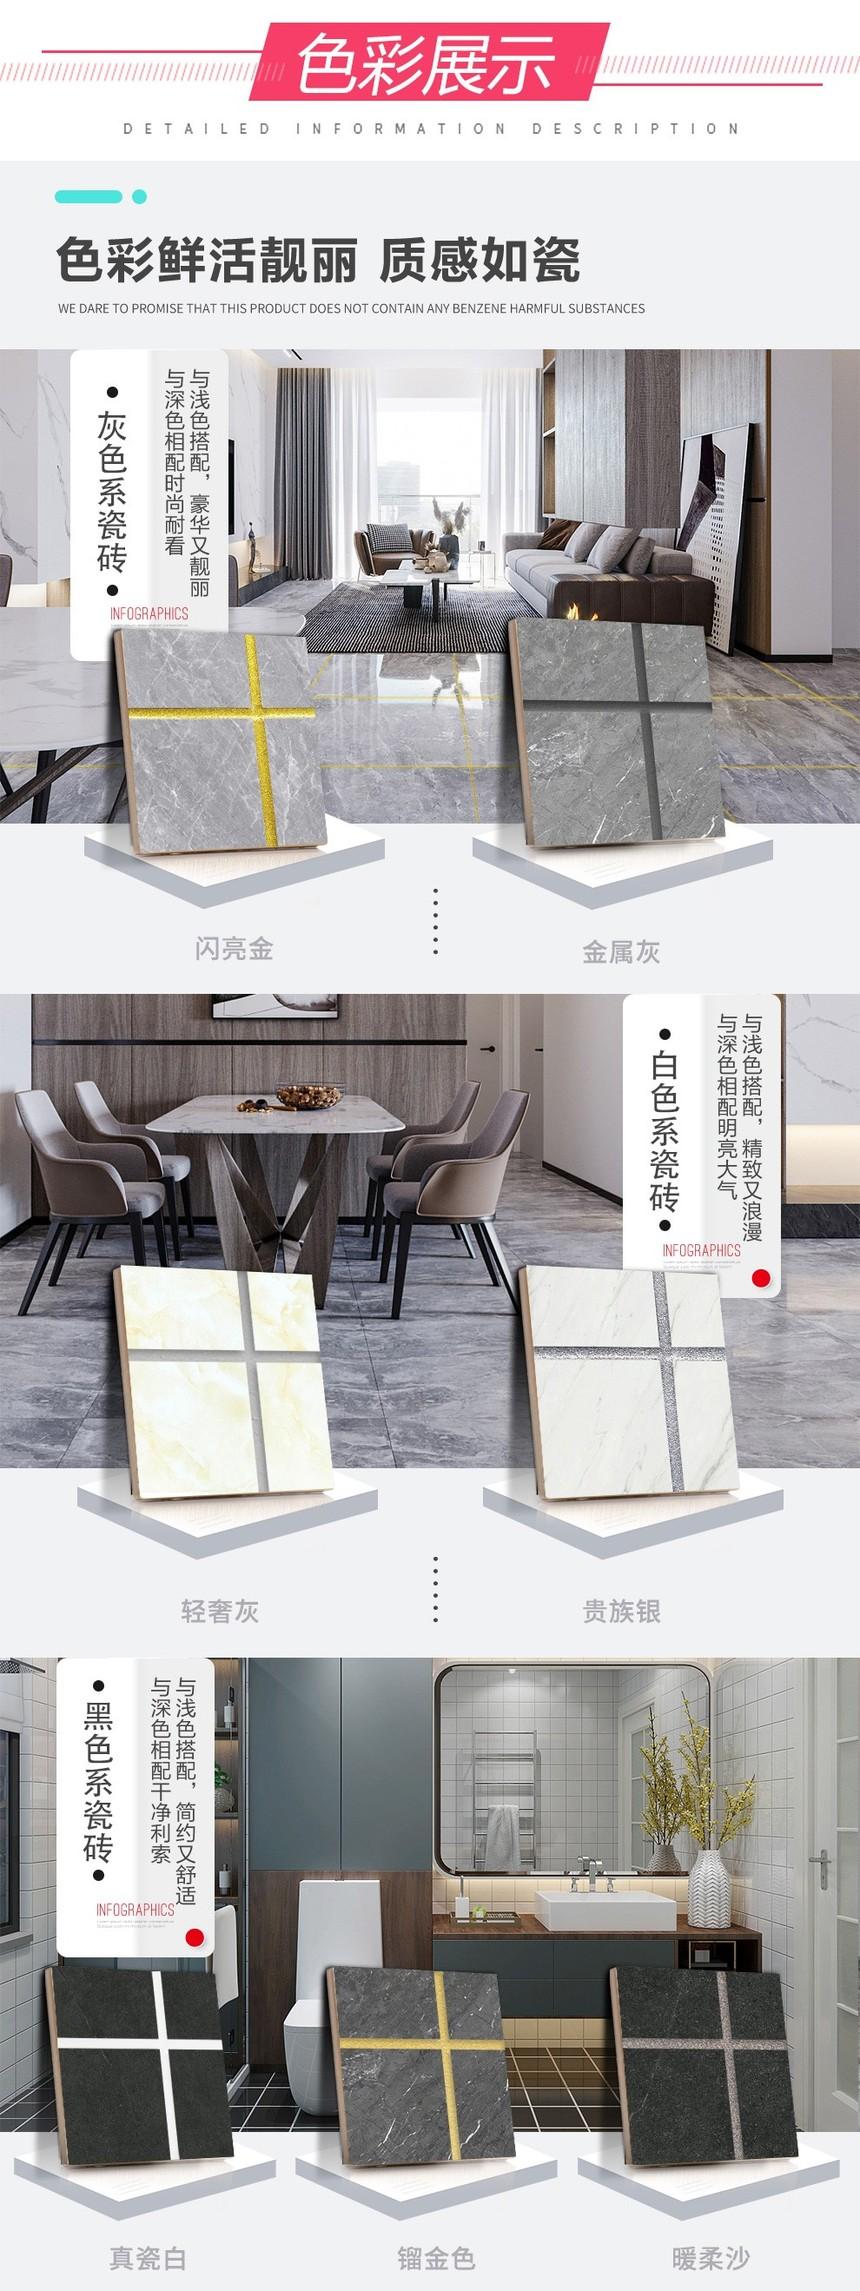 DIY美縫詳情頁-0603-定稿(1)_13.jpg